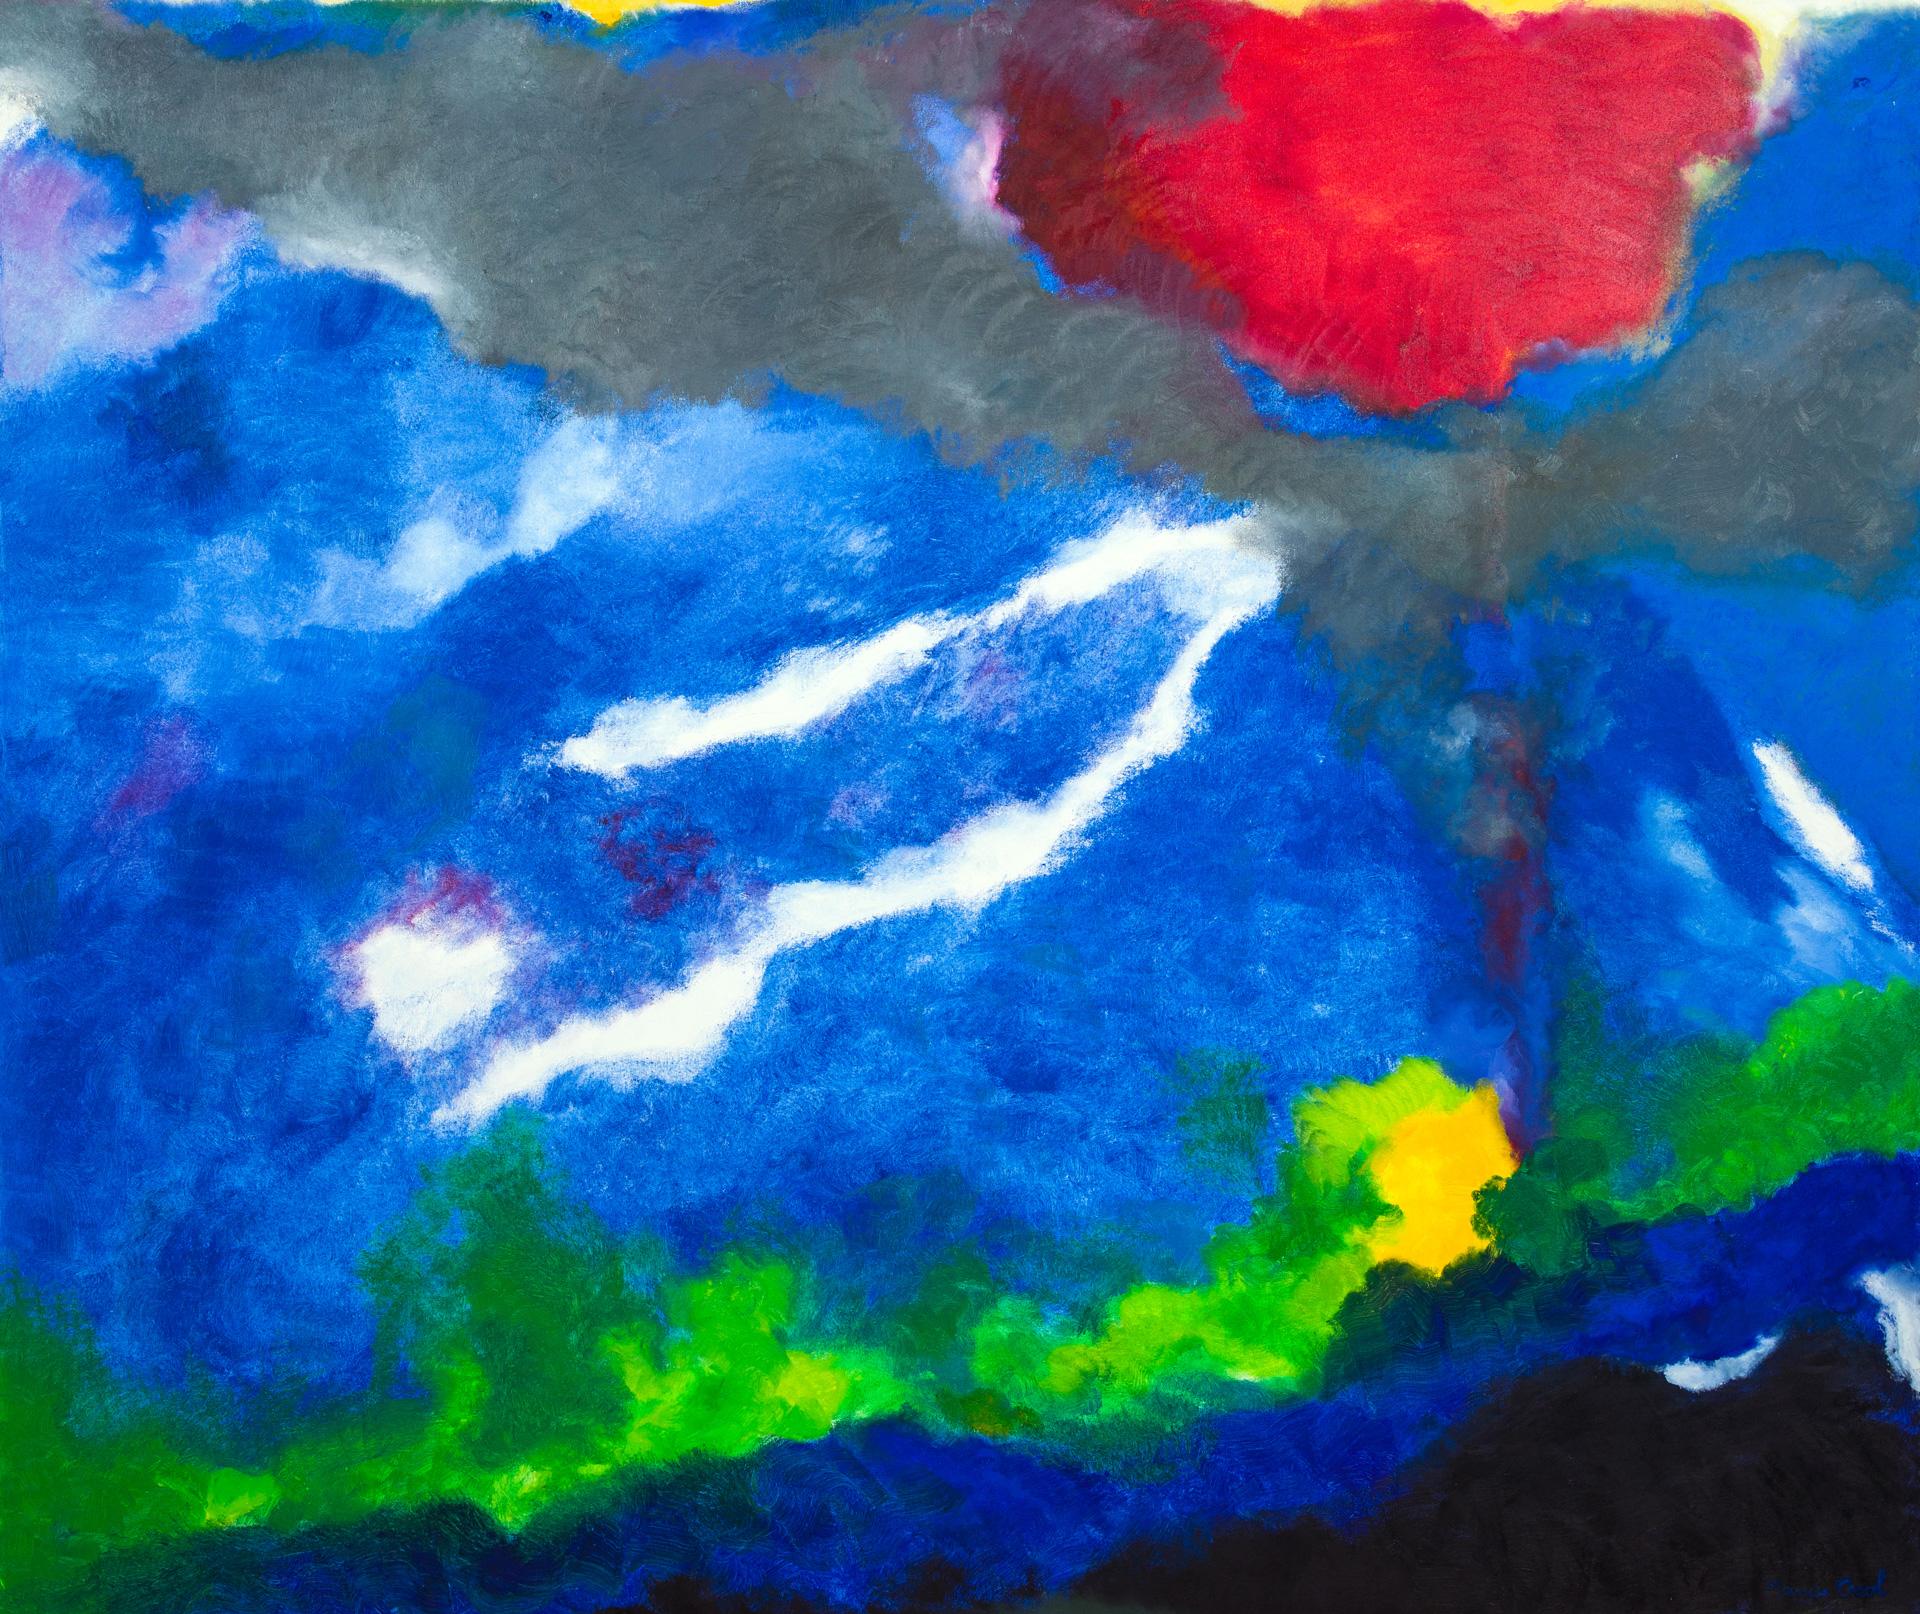 Maryse Casol, peinture Ceci N'est Pas Un Arbre IX, 2014